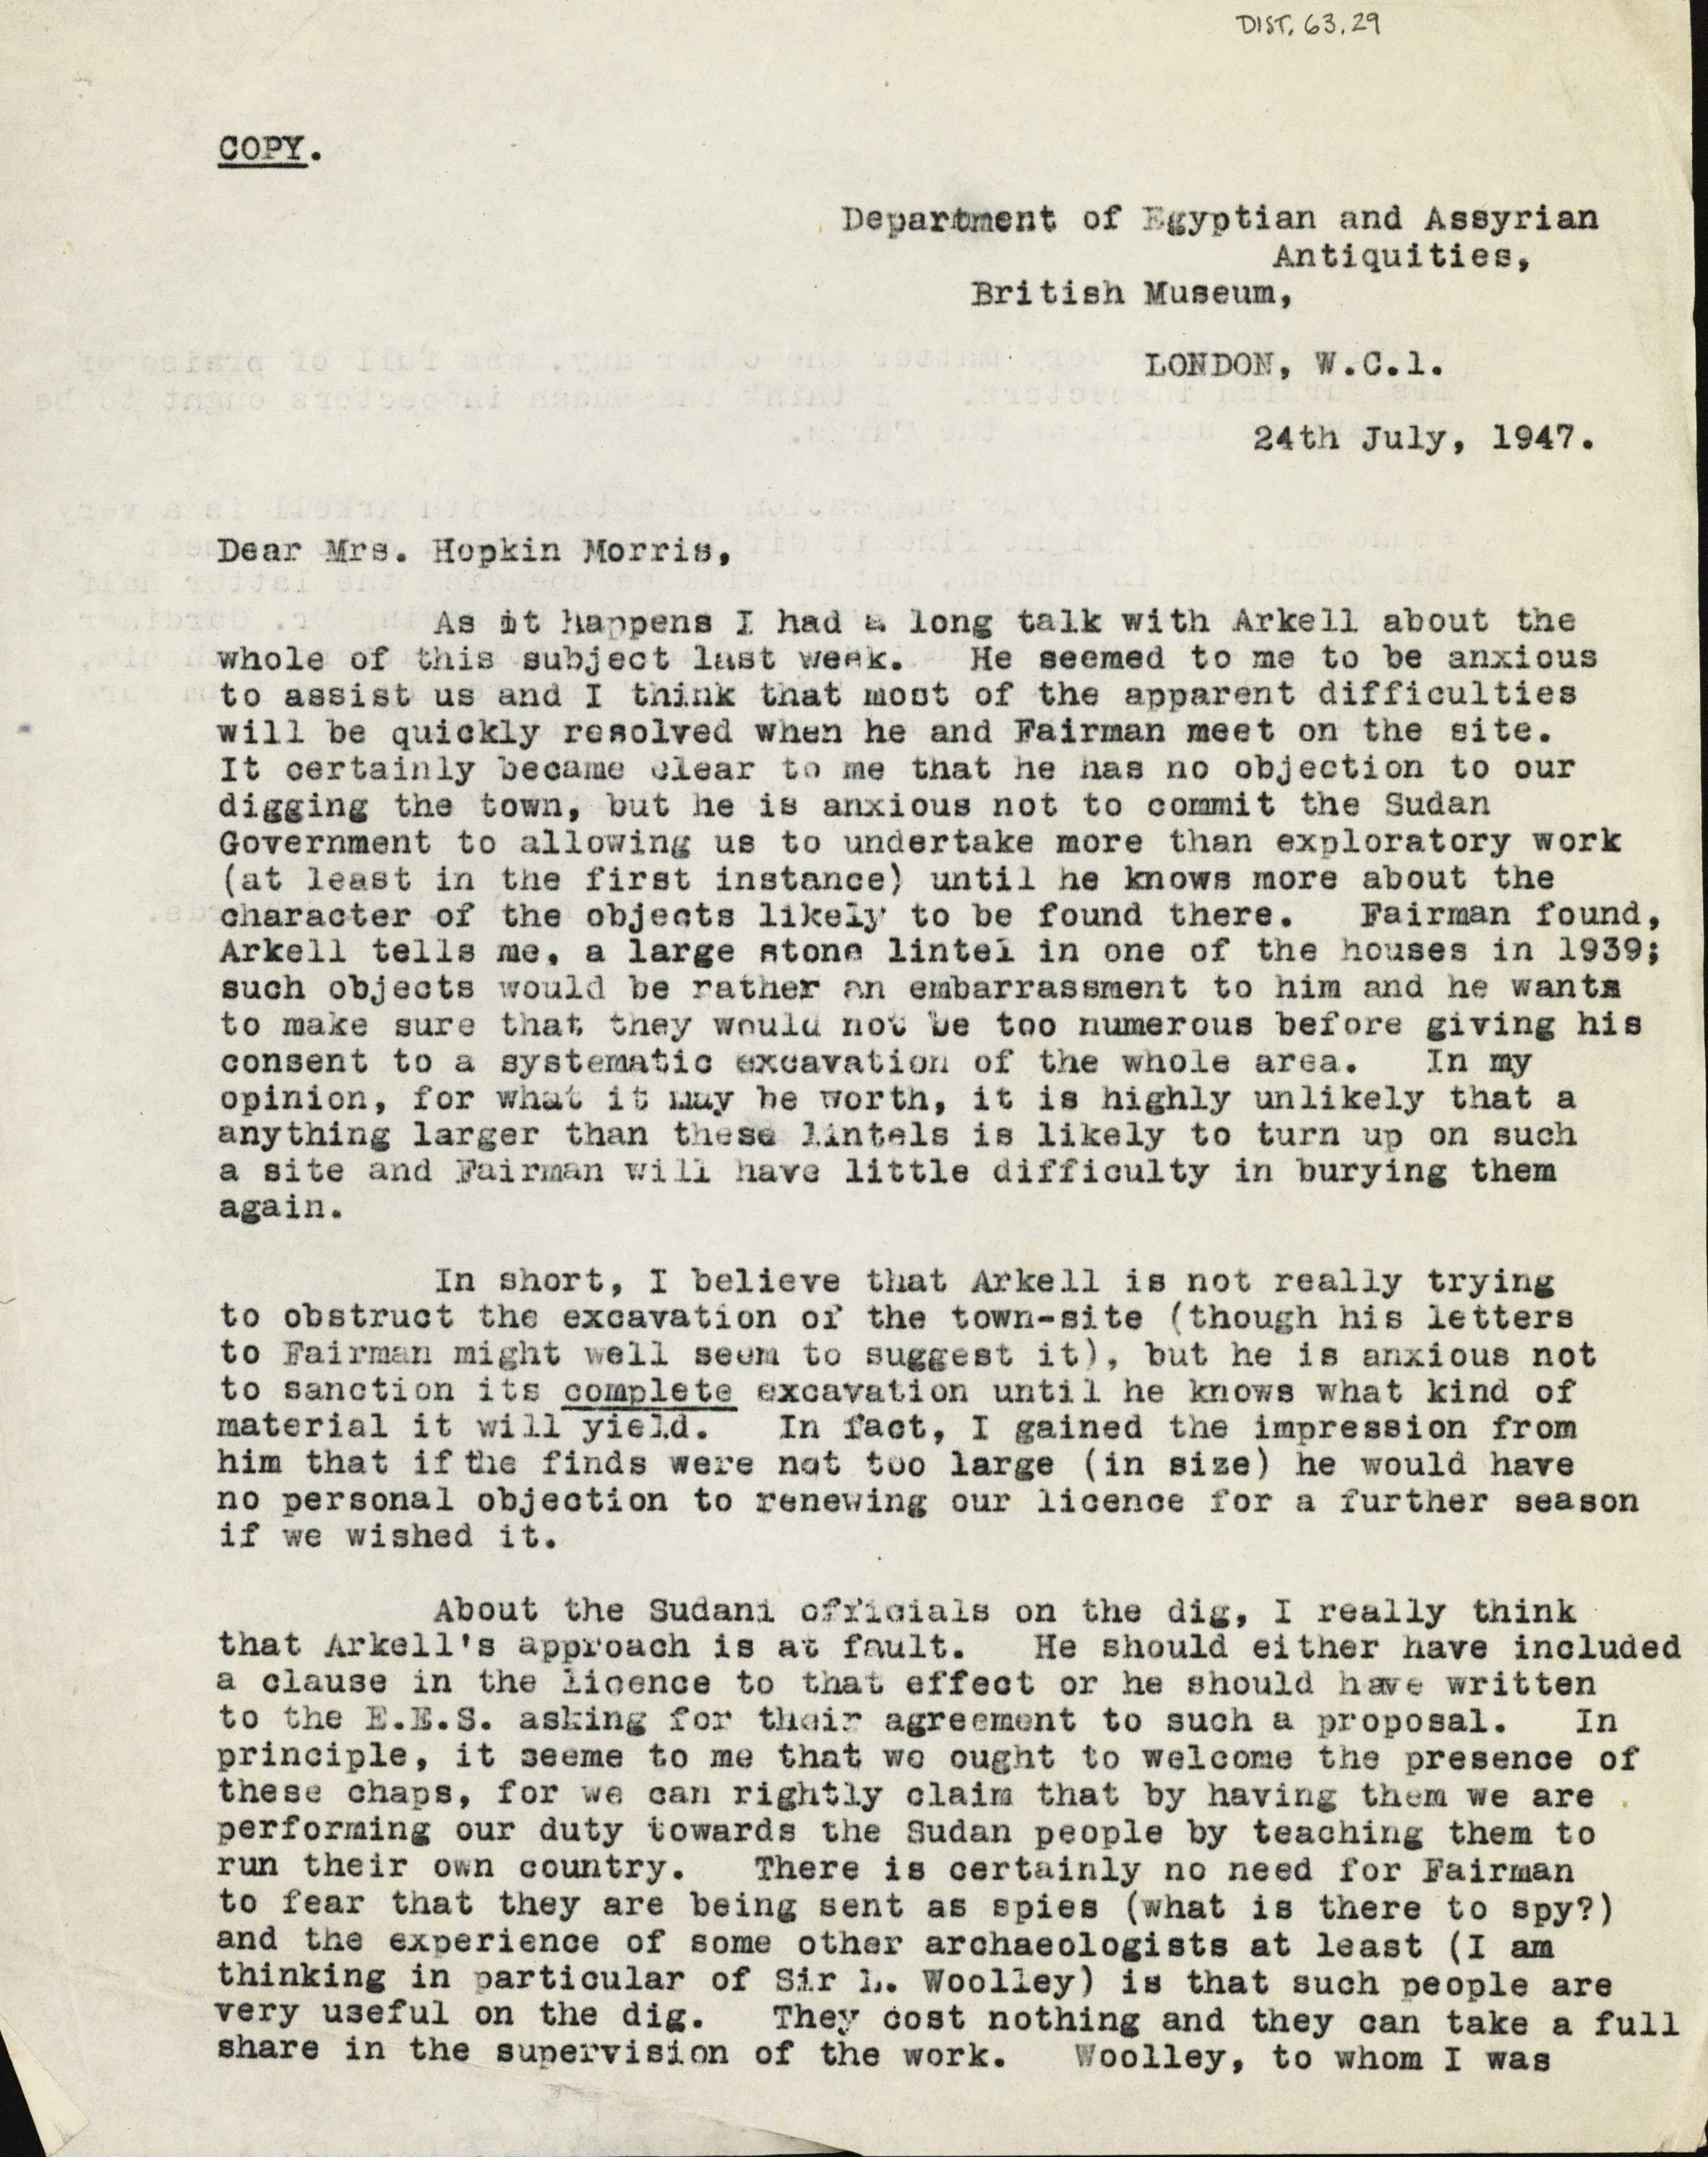 1936-39 Amarah West, Sesebi DIST.63.29a